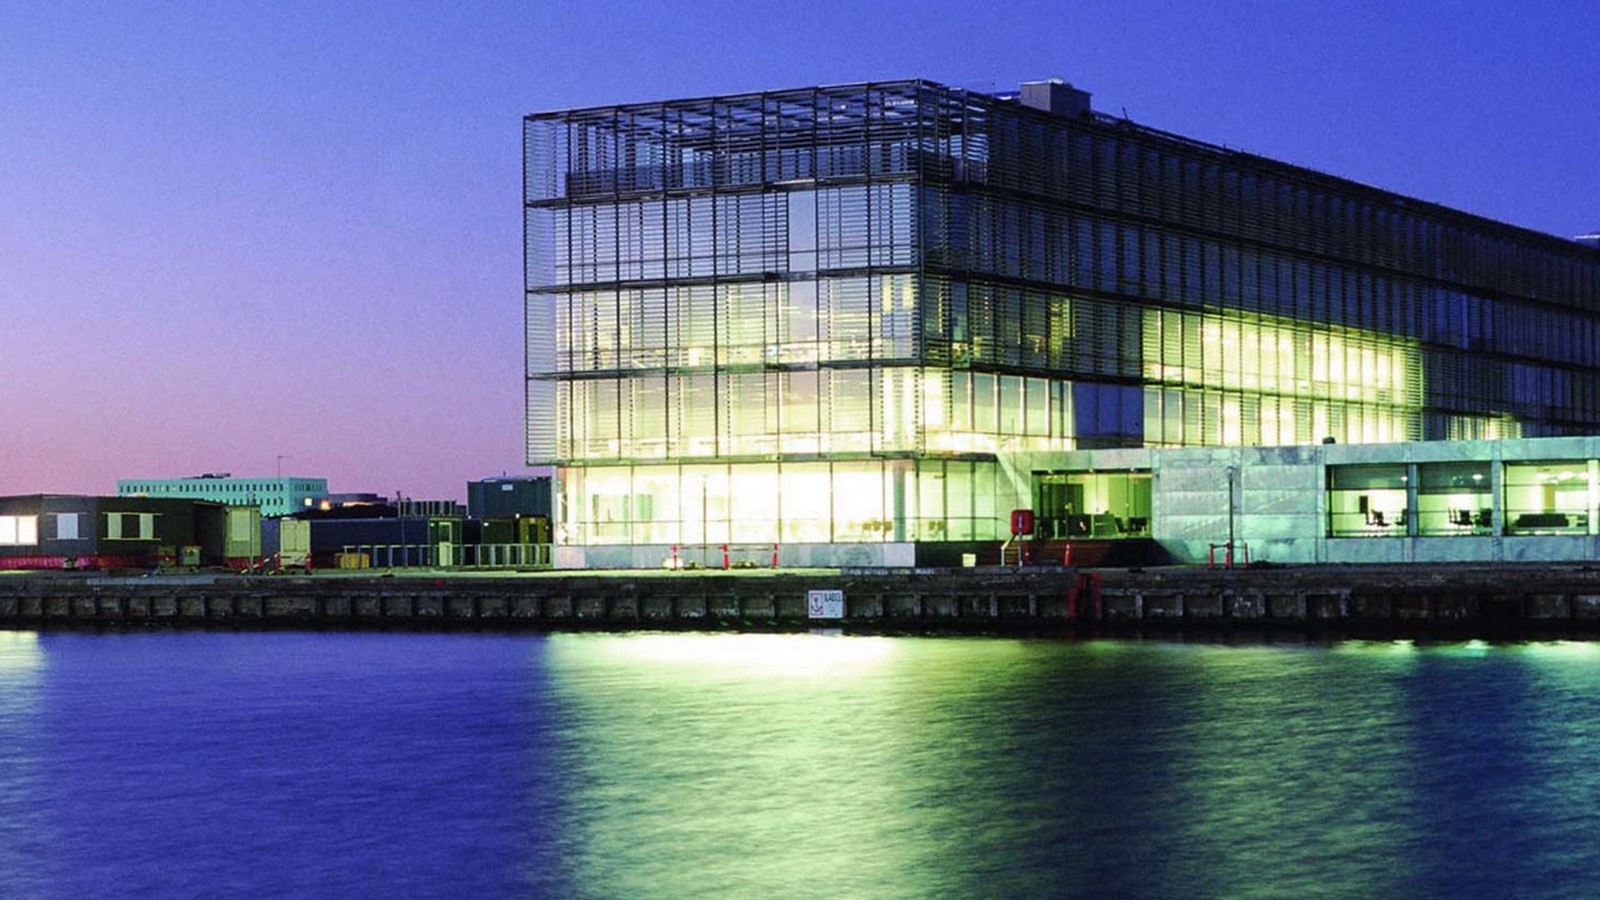 Hugo Boss Headquarters Copenhagen - Sheet1